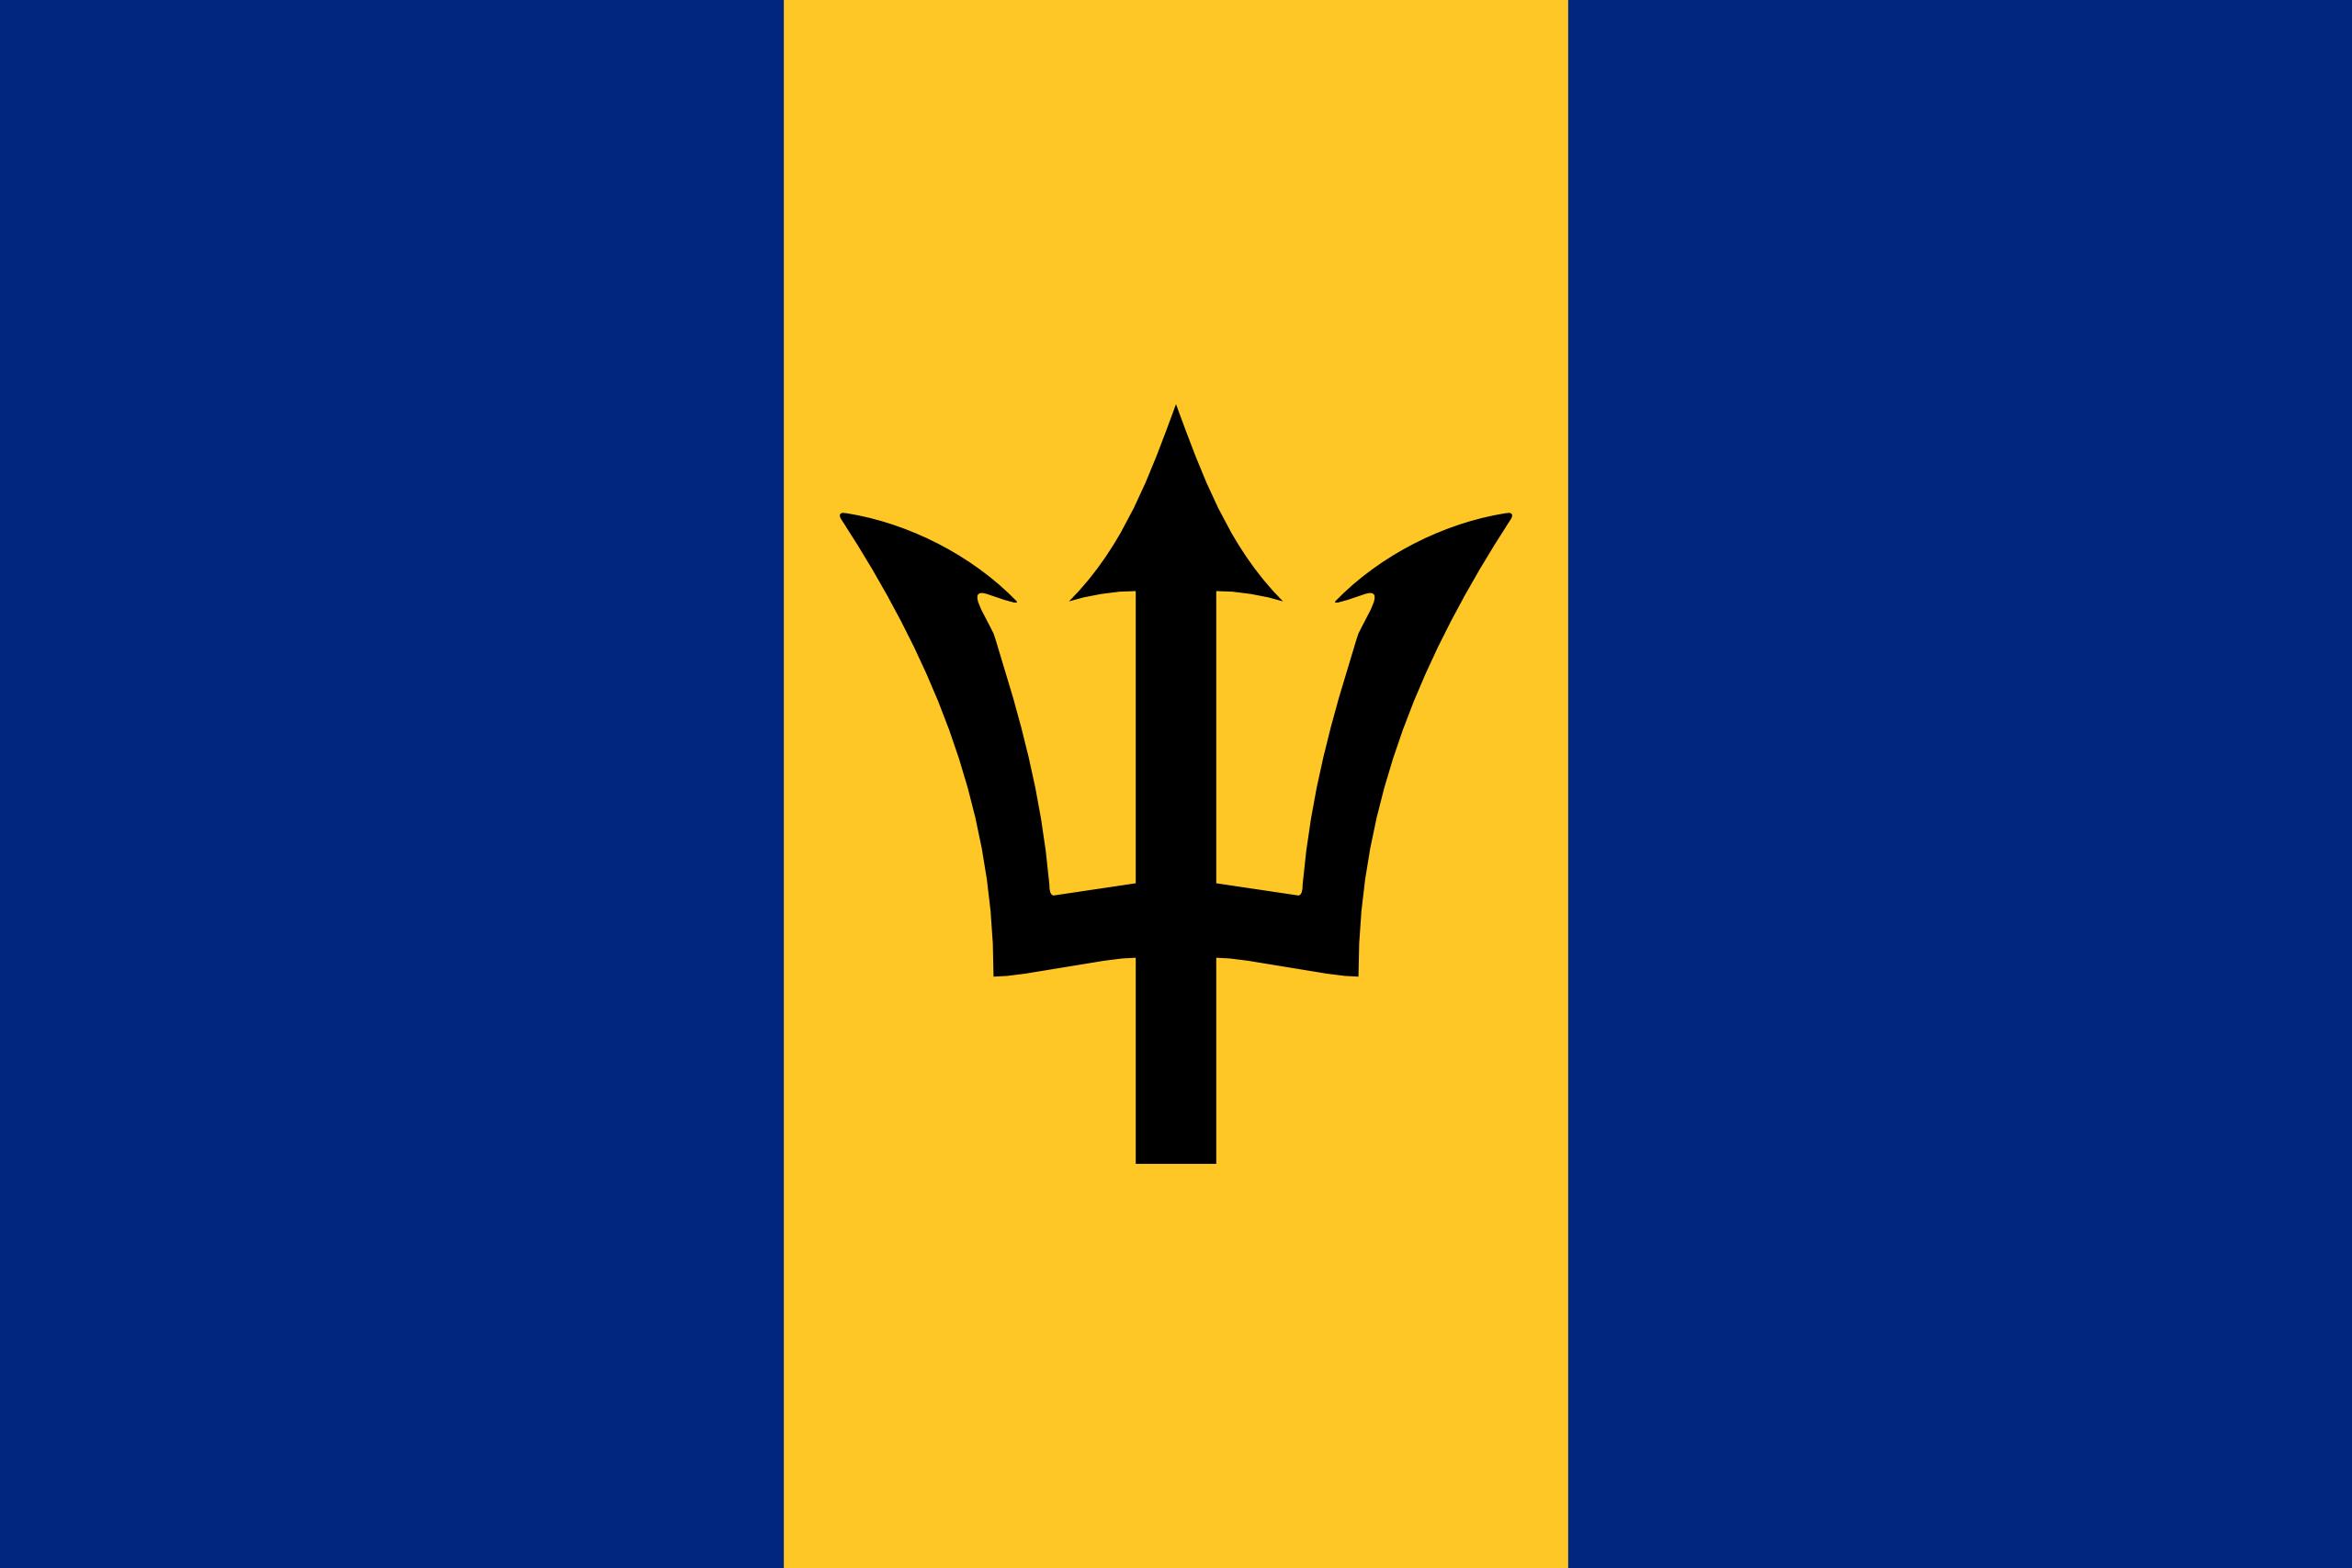 Atlantic League of Commonwealths